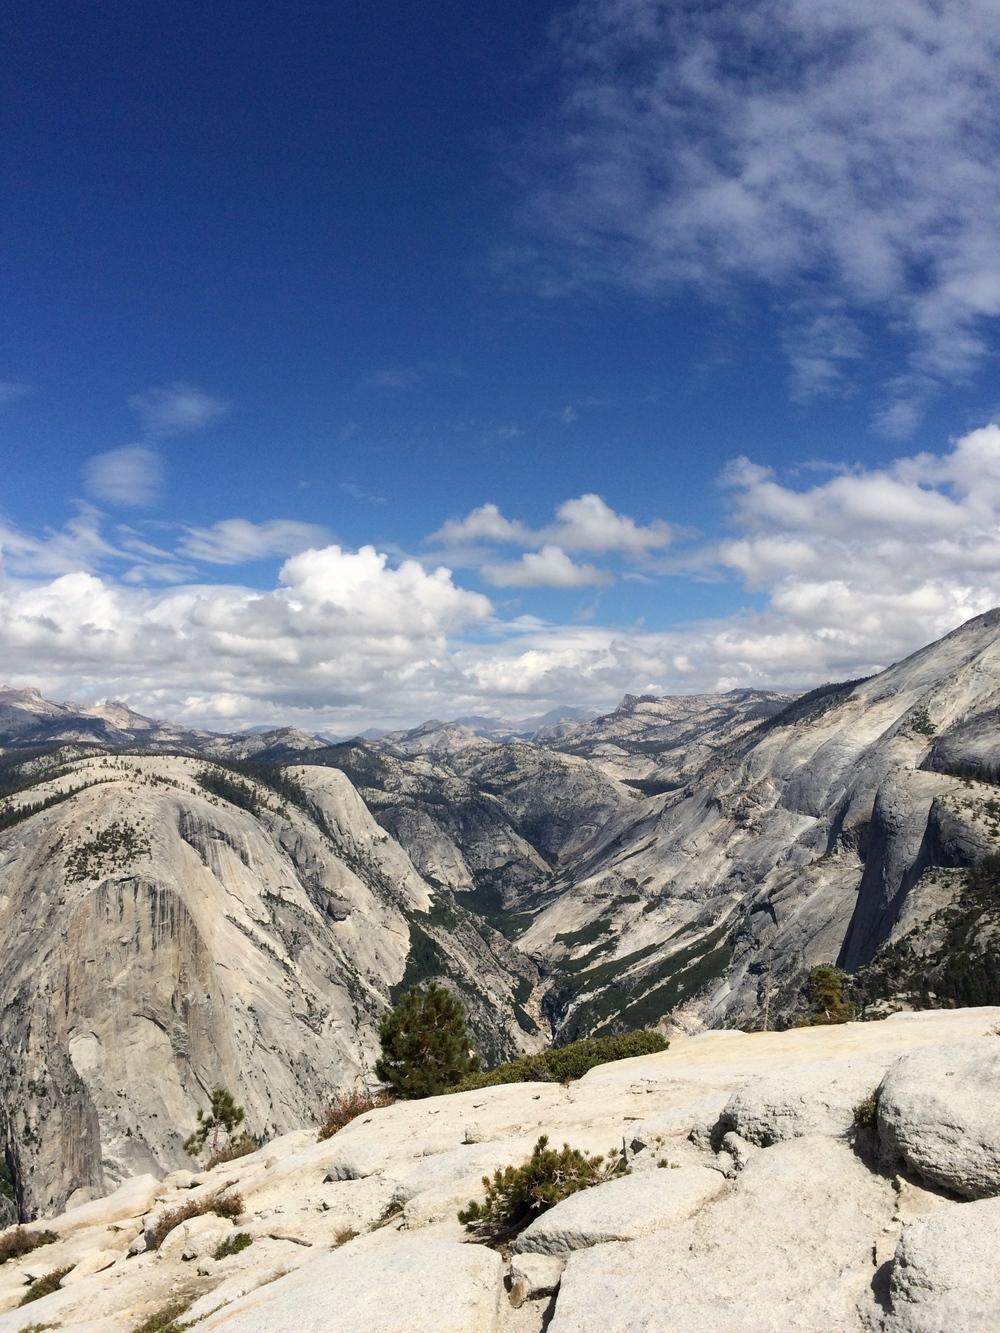 One vista of many.